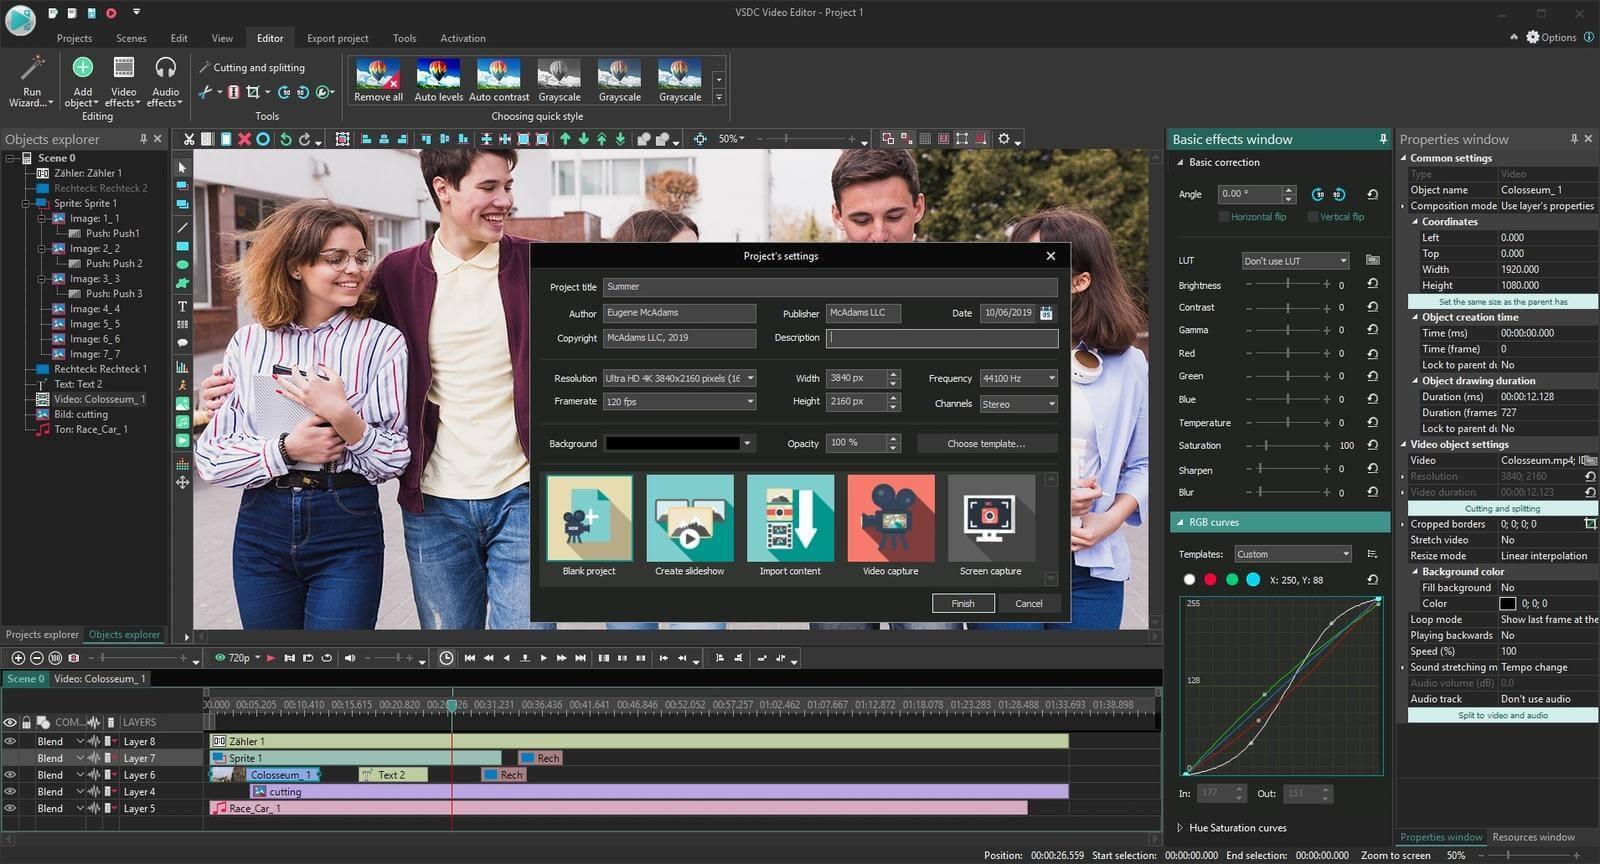 Free Video Editor kostenloses Videoschnittprogramm